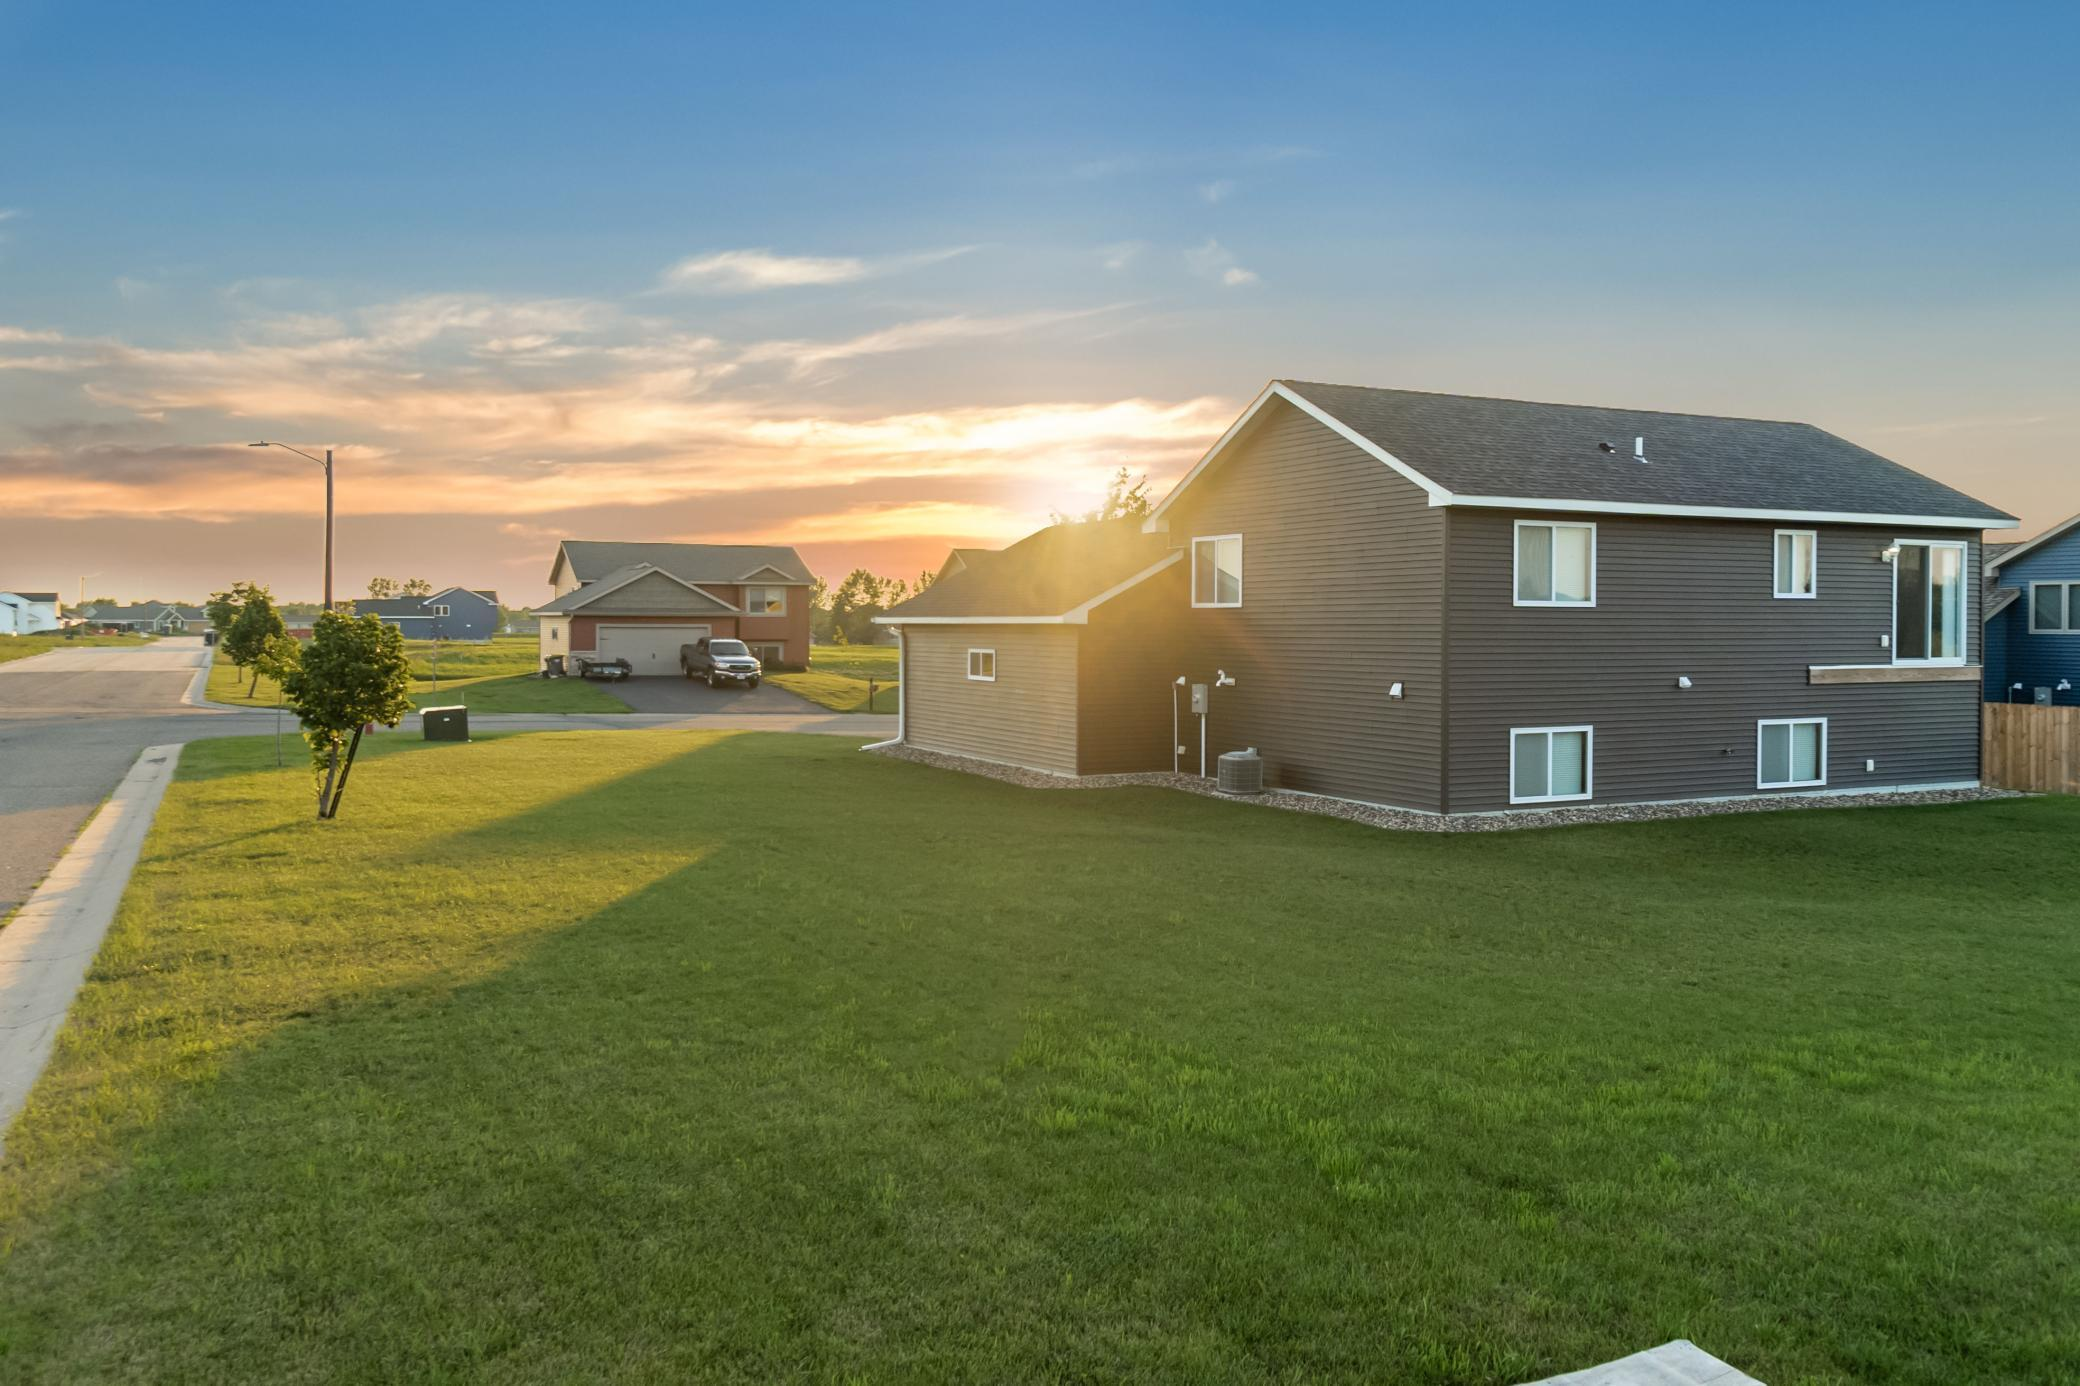 233 Pintail Property Photo - Baldwin, WI real estate listing